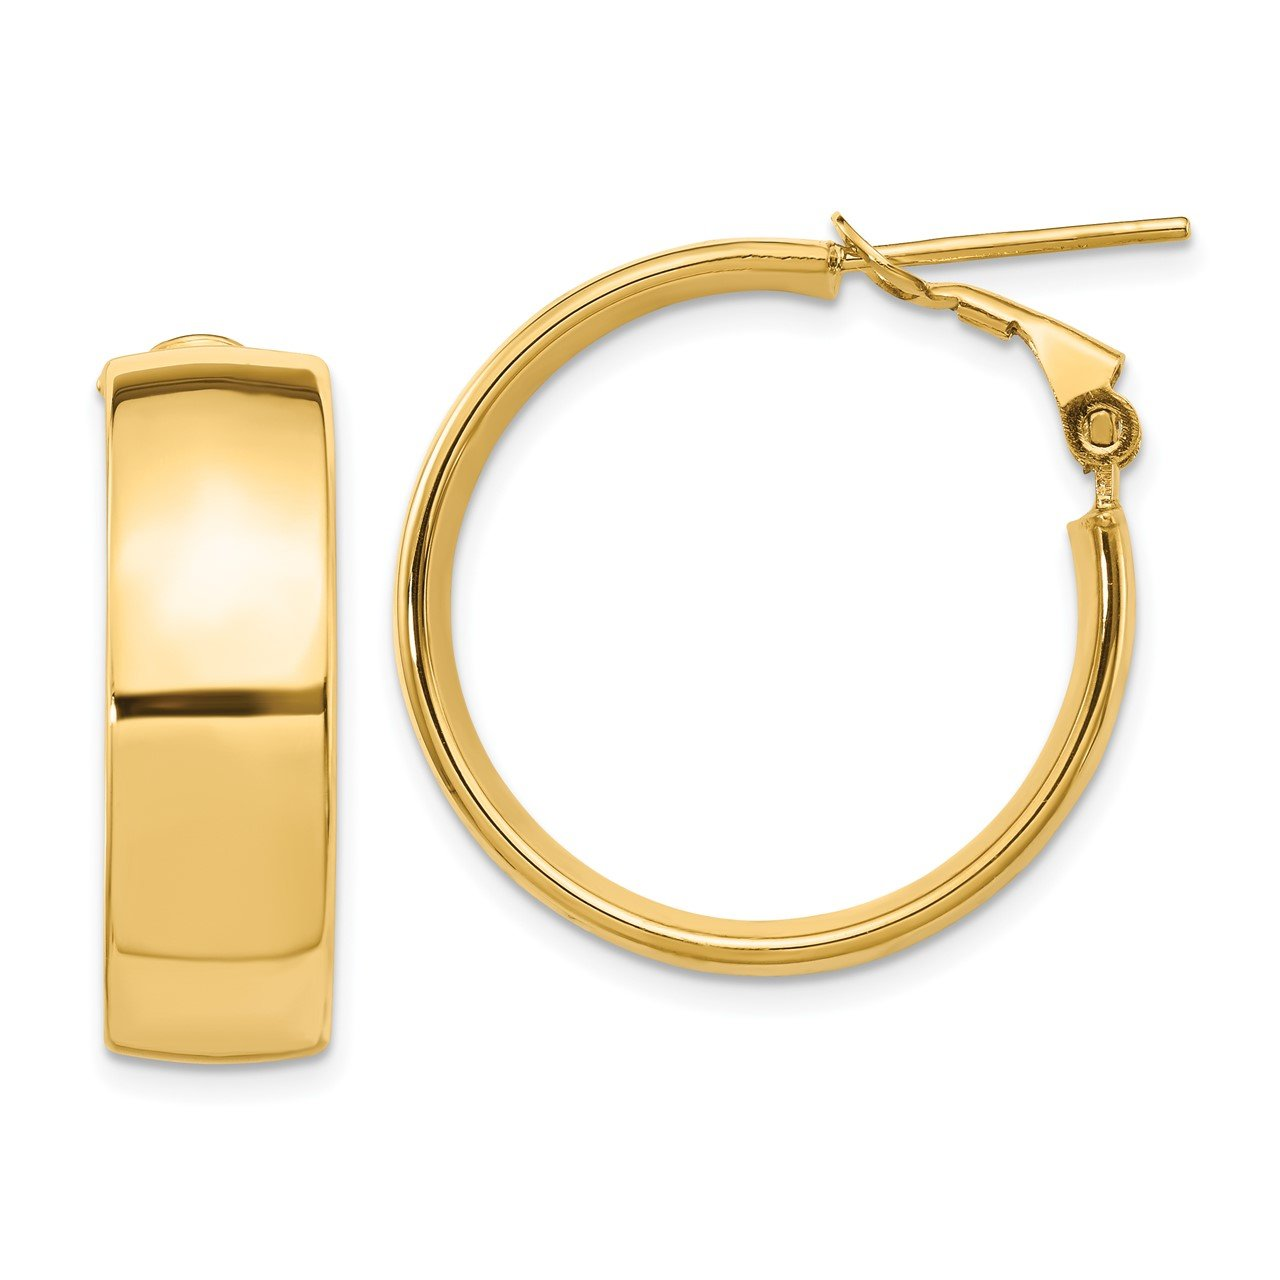 Leslie's 14K 7.75mm High Polished Omega Back Hoop Earrings